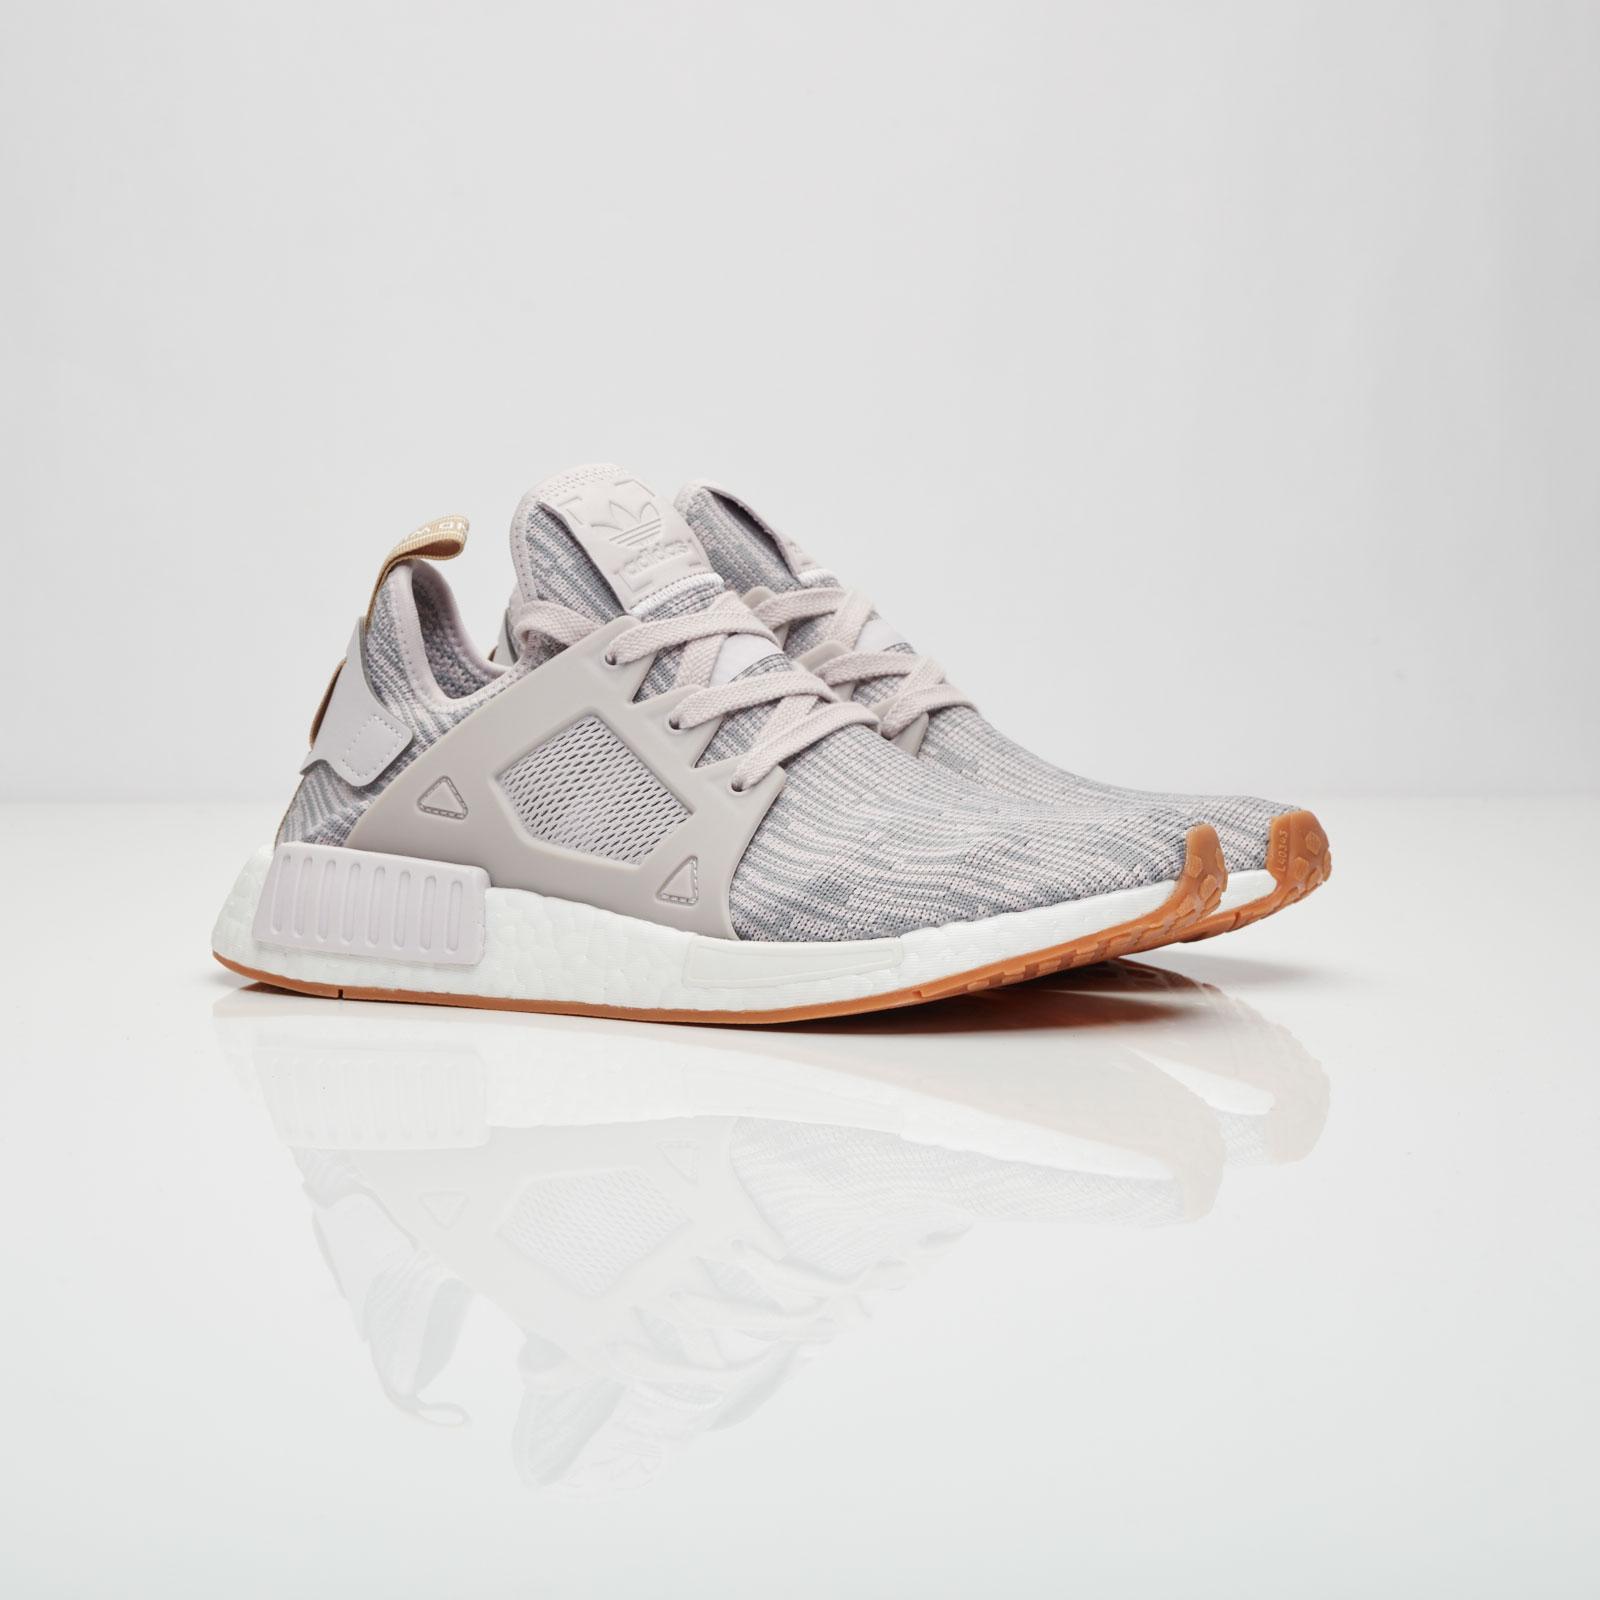 6dba07ea3e8ba adidas NMD XR1 PK W - Bb2367 - Sneakersnstuff